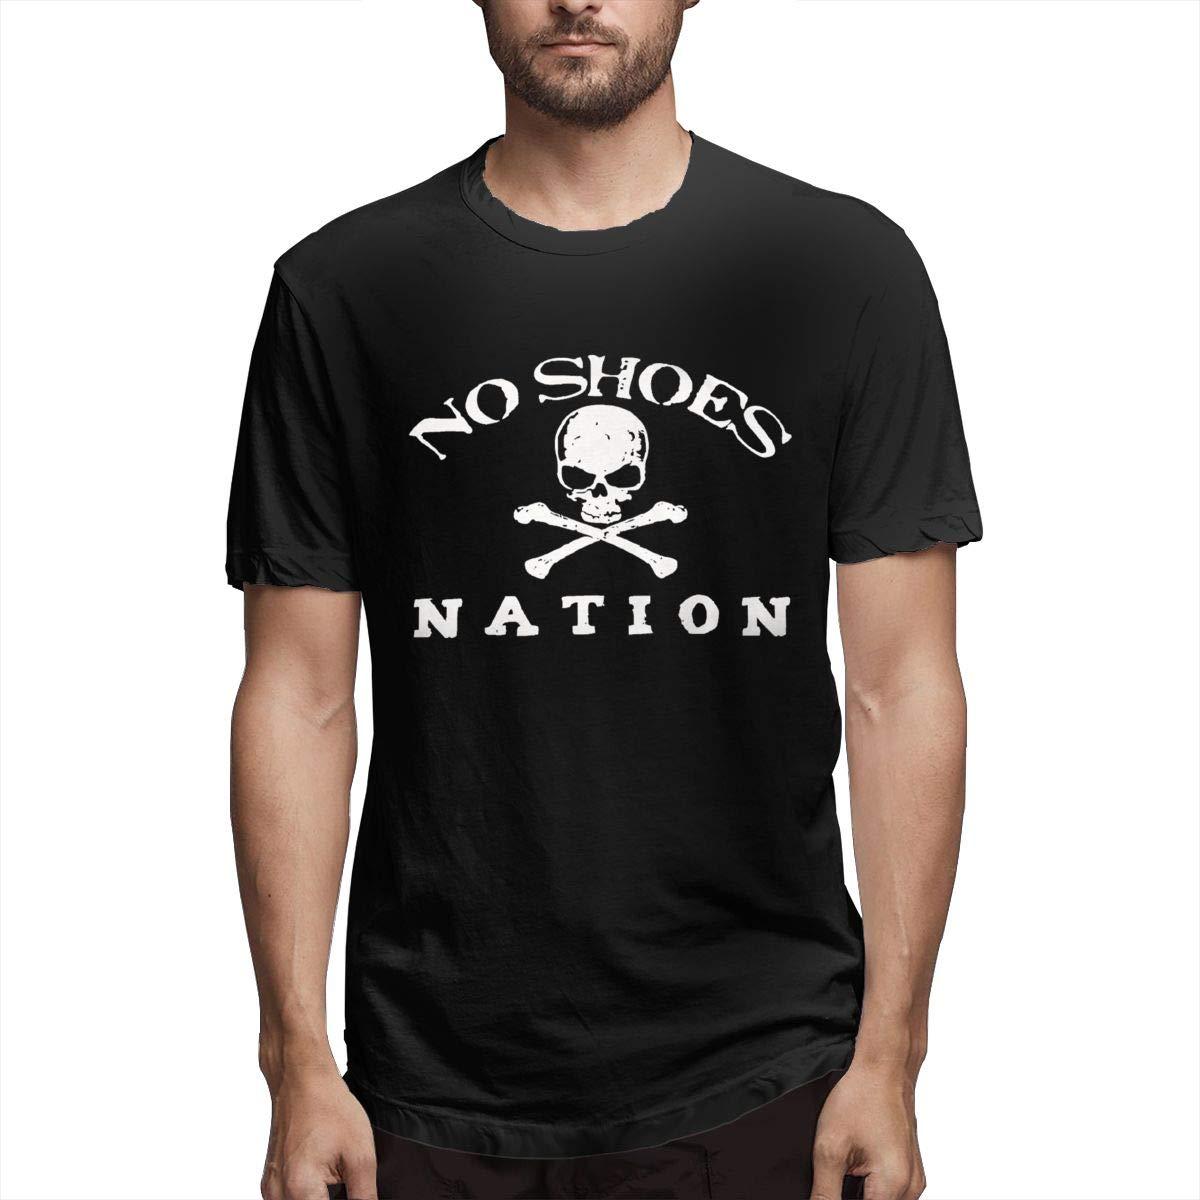 Noshoesnation Retro Vintage Shirt Black